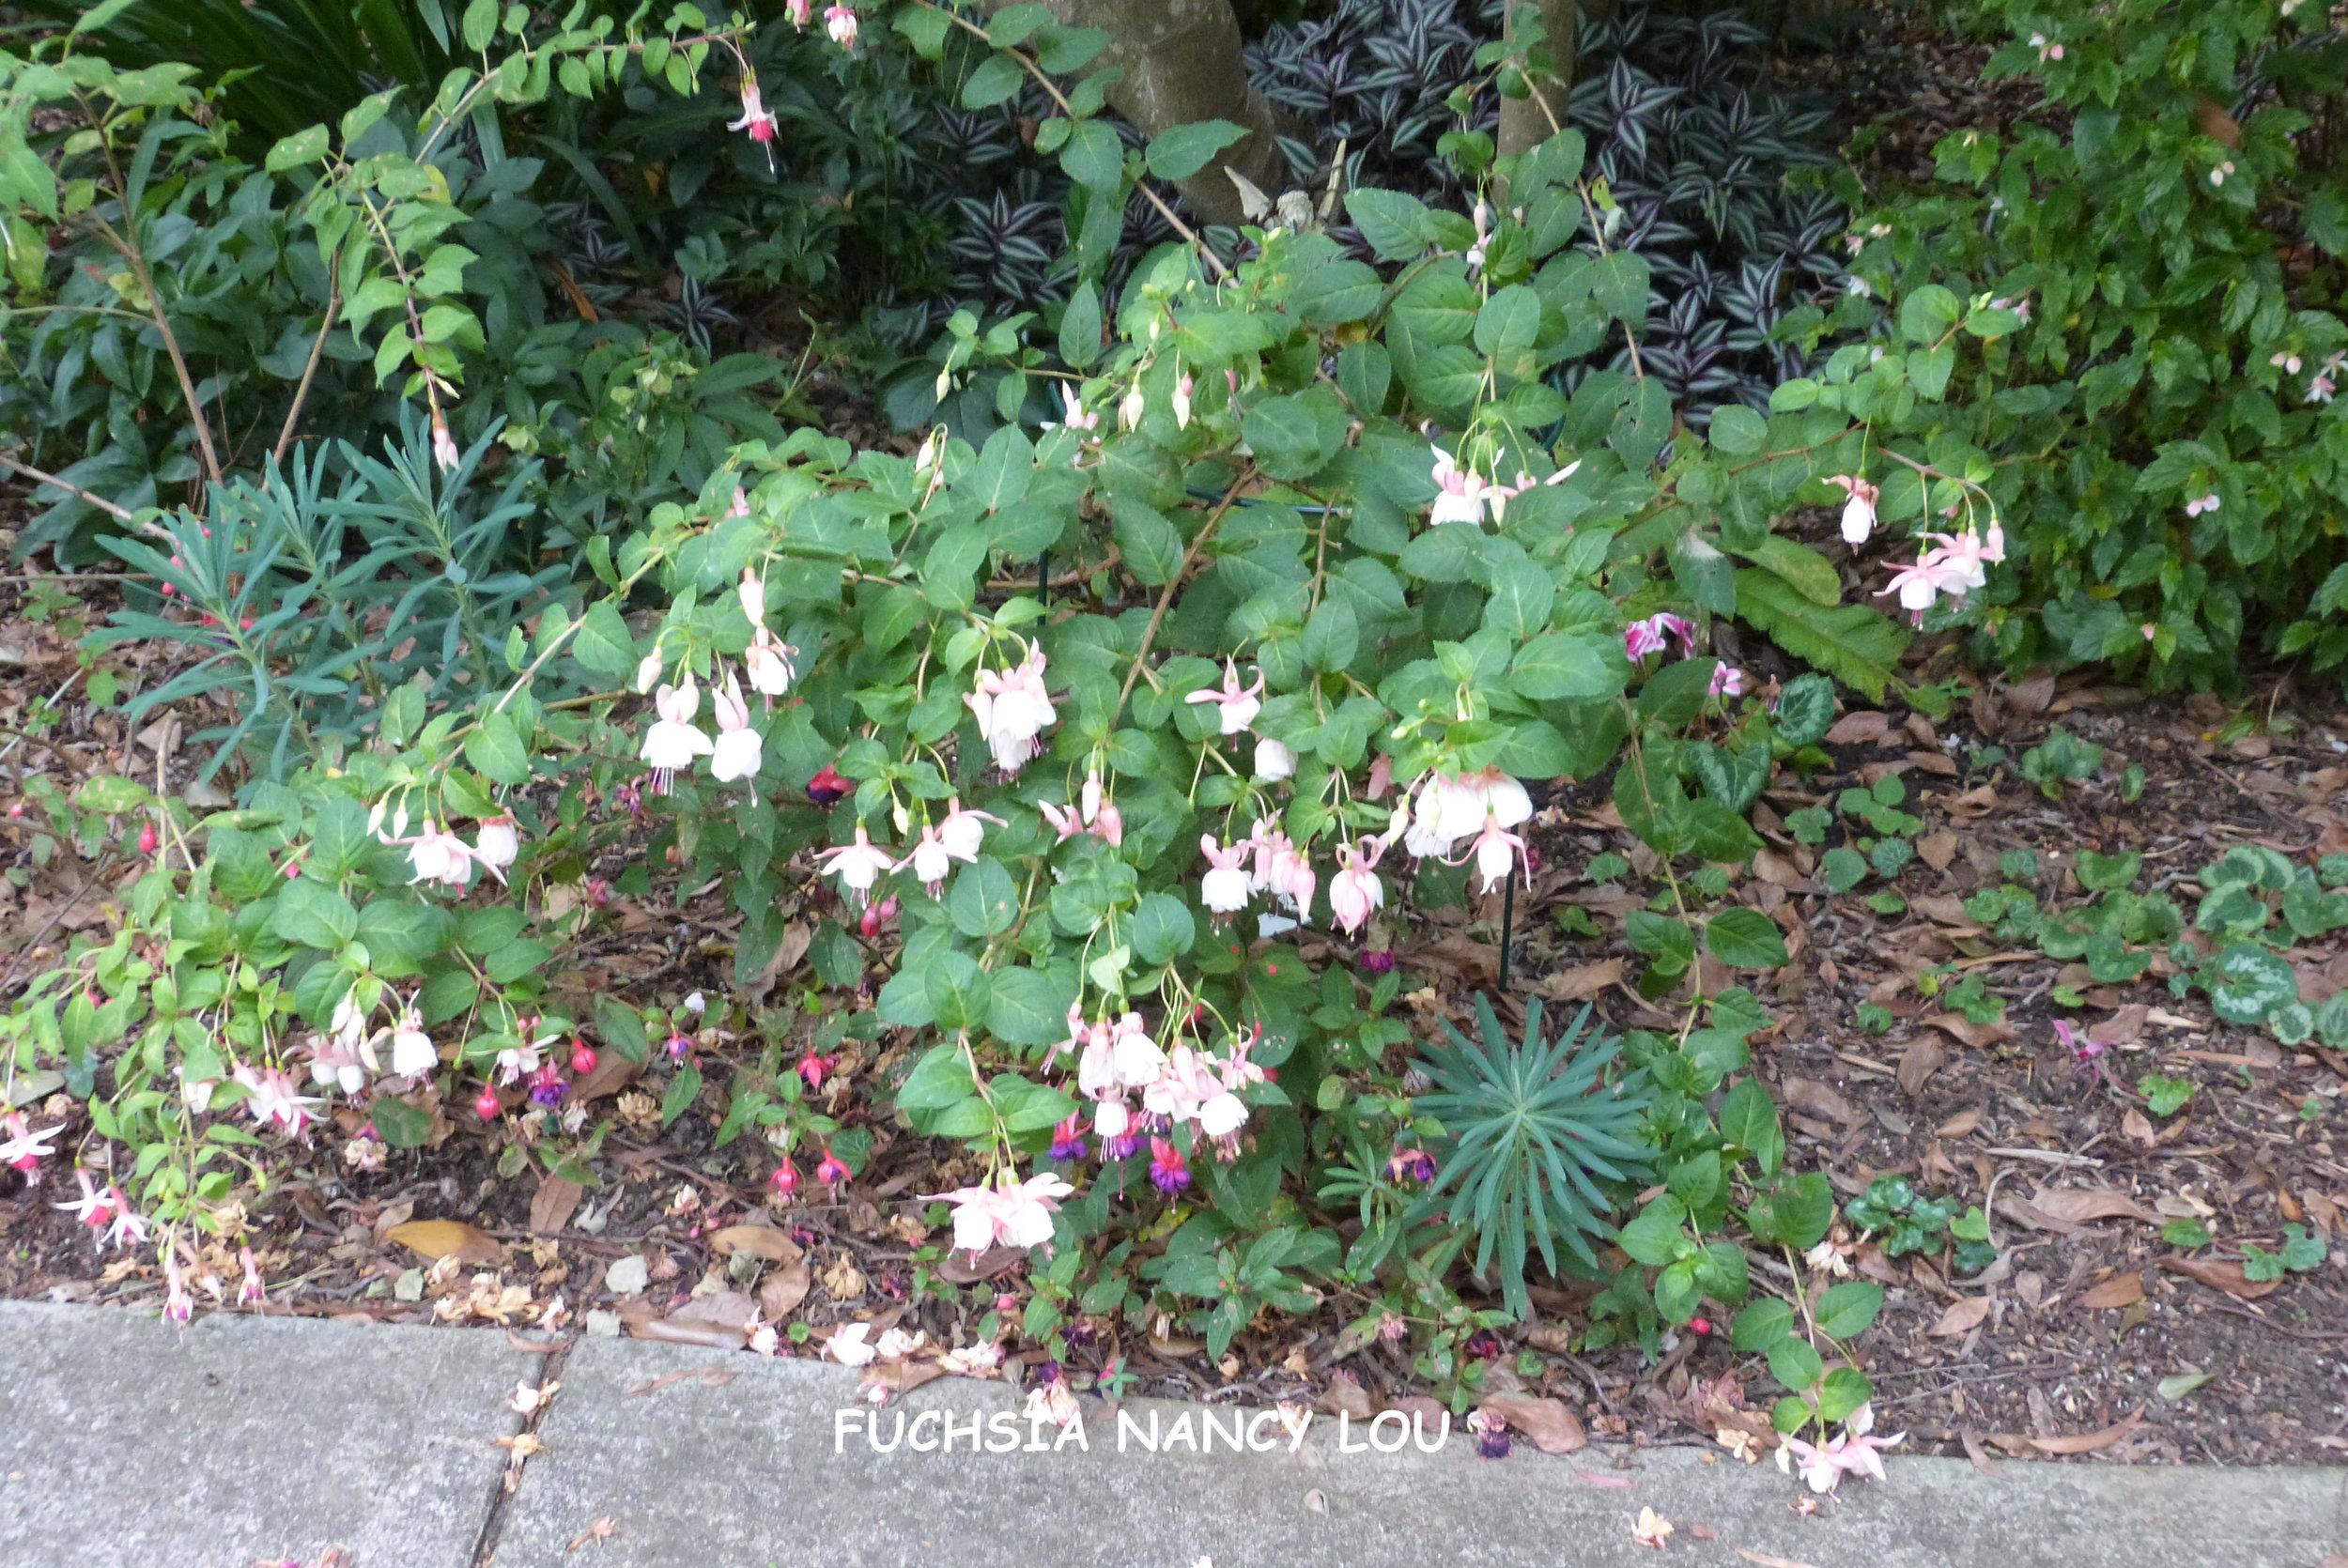 Fuchsia Nancy Lou